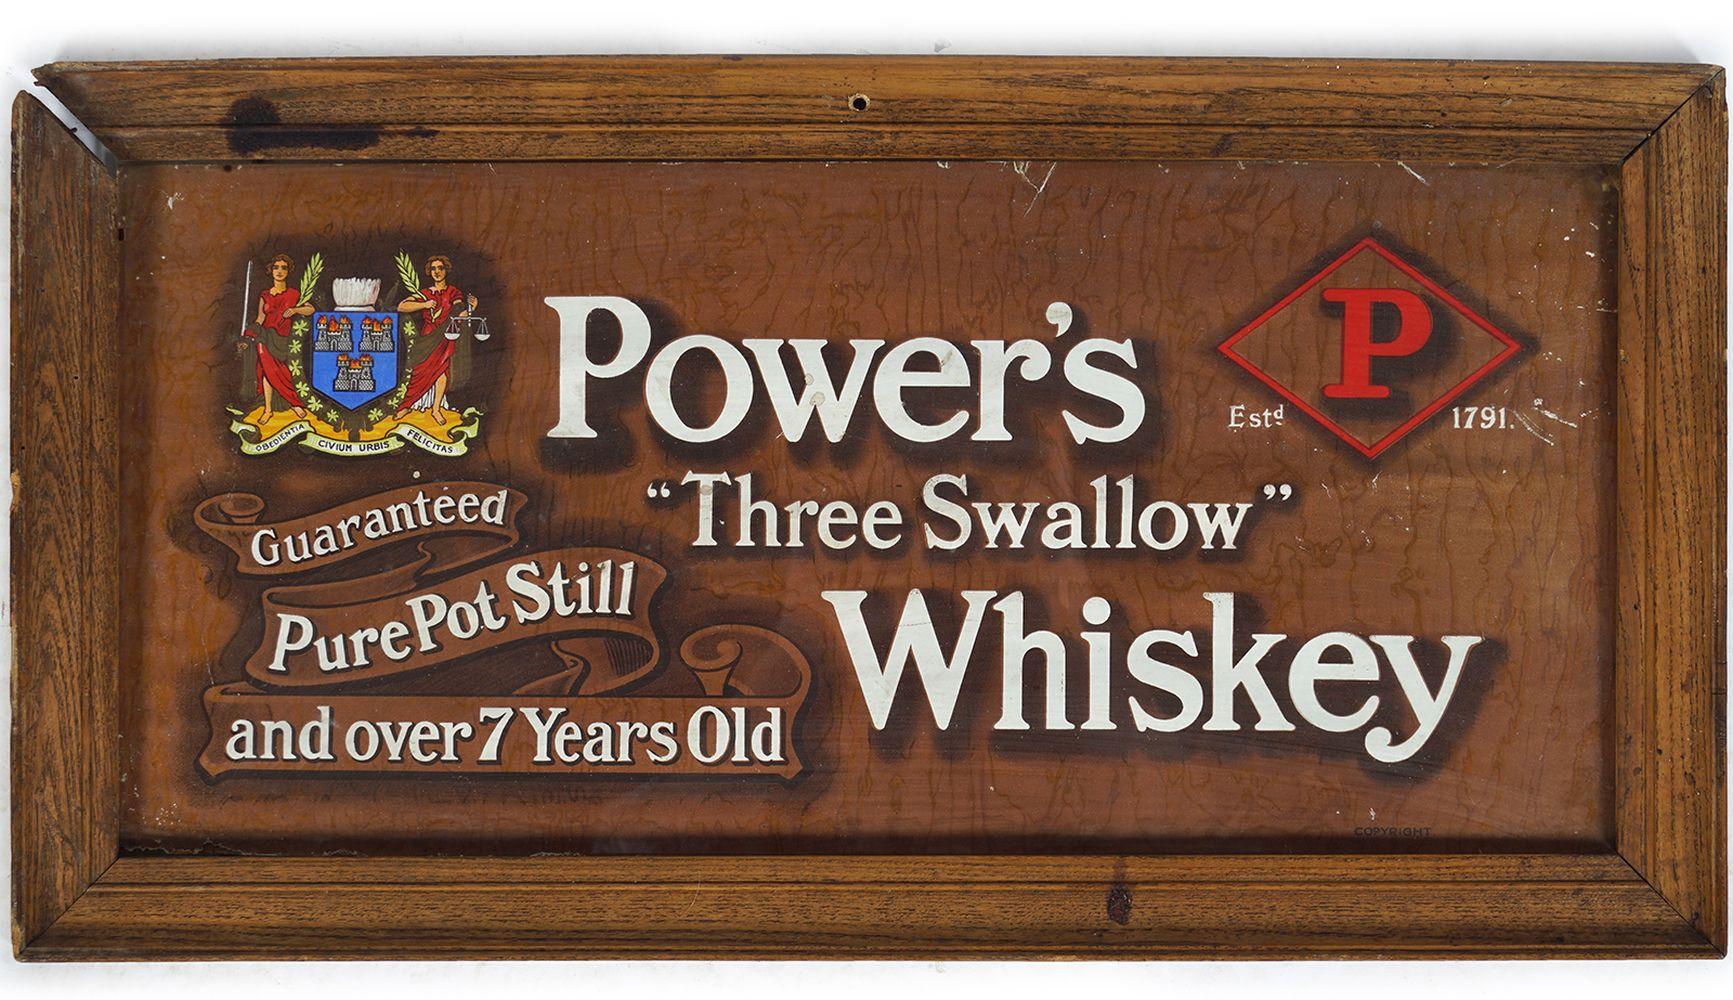 POWERS THREE SWALLOW WHISKEY ORIGINAL POSTER